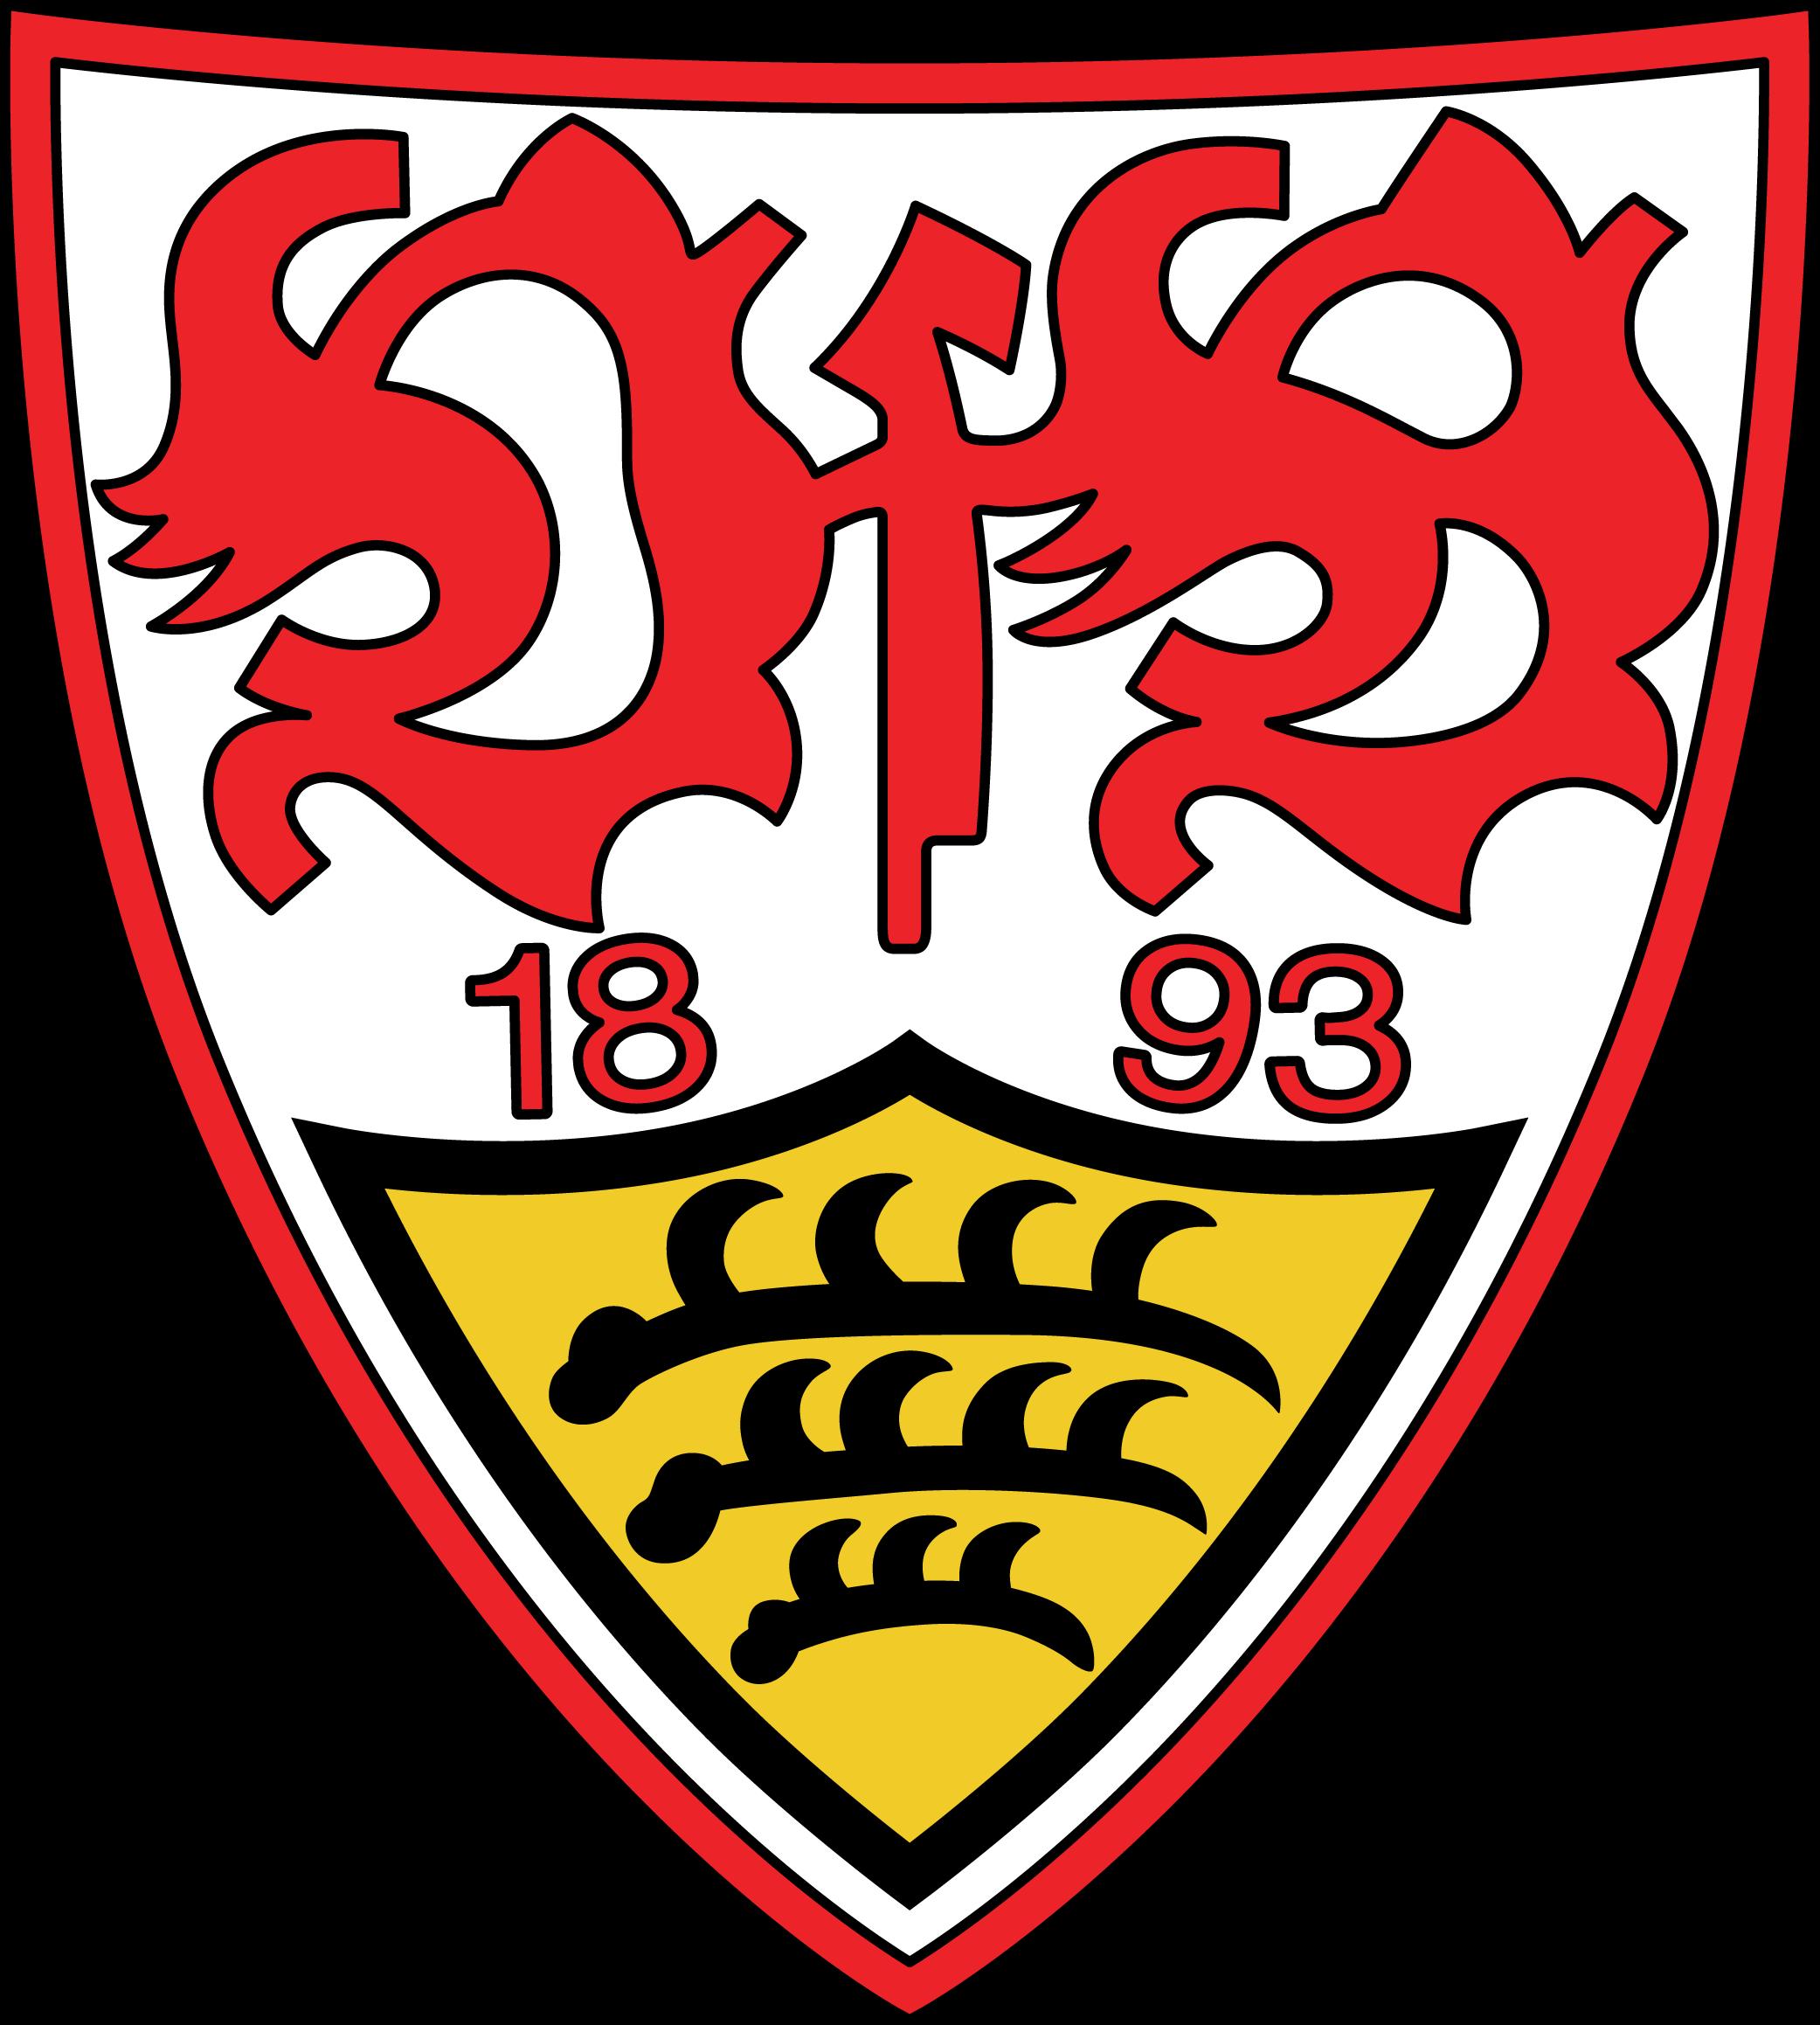 Vfb Stuttgart Germany Football Team Logos Football Logo German Football Clubs